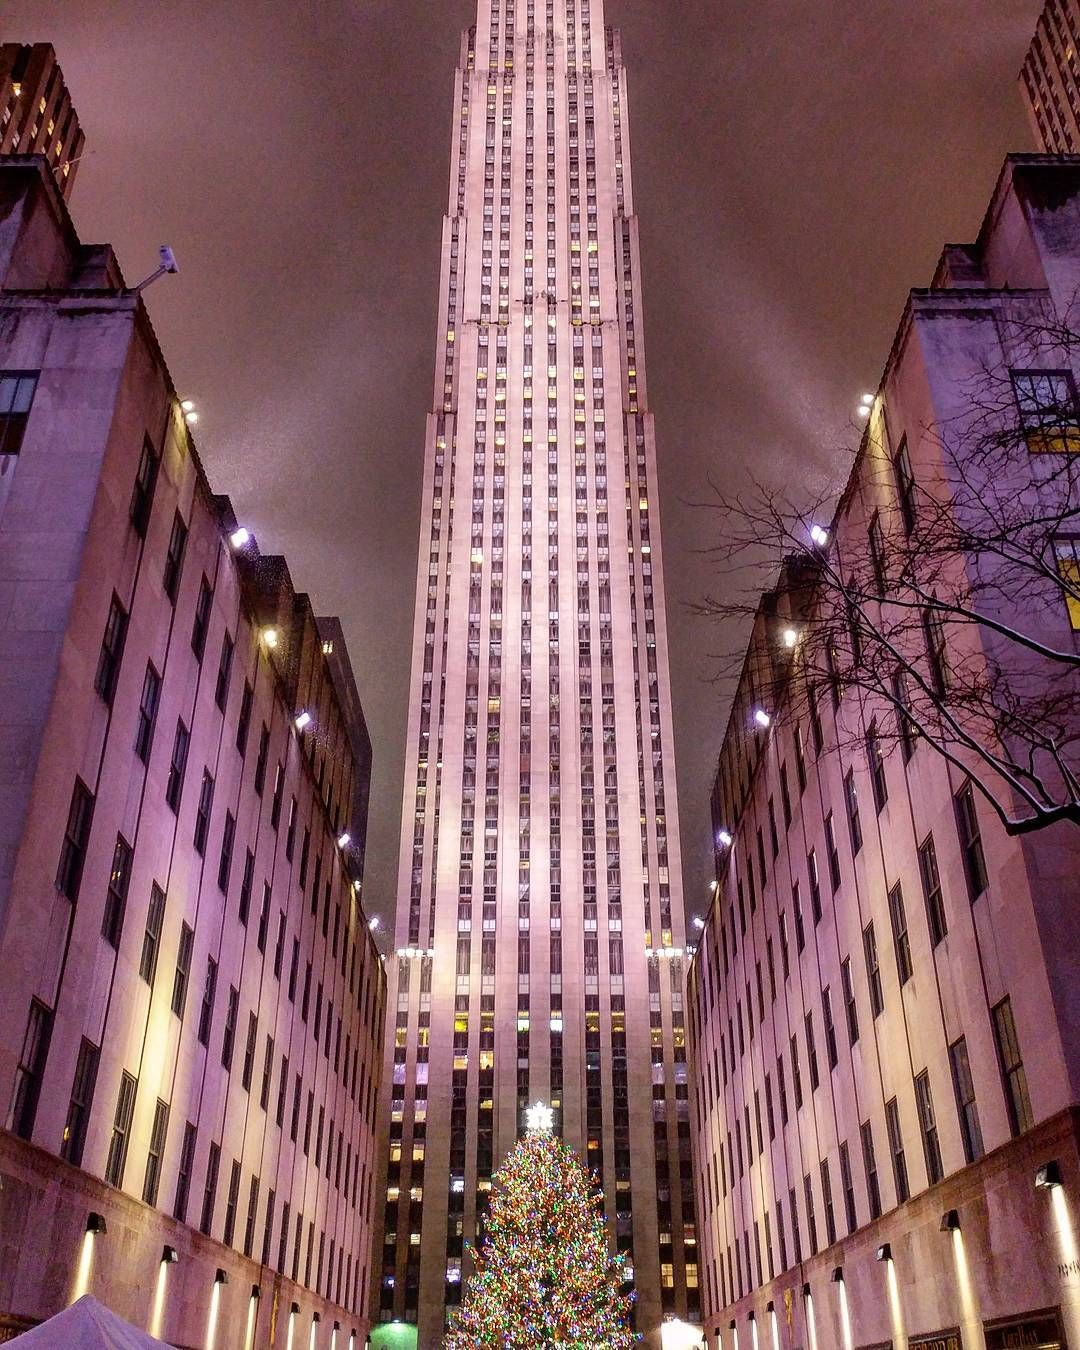 Rockefeller Center Christmas Tree  @rockcenternyc #rockefellercenter #rockefellertree #rockefellerchristmastree #christmastree #christmastime #merrychristmas #newyorkcity #newyorkny #nyc #manhattan #manhattanny #midtownnyc #midtown #nycrealestate #modarealty